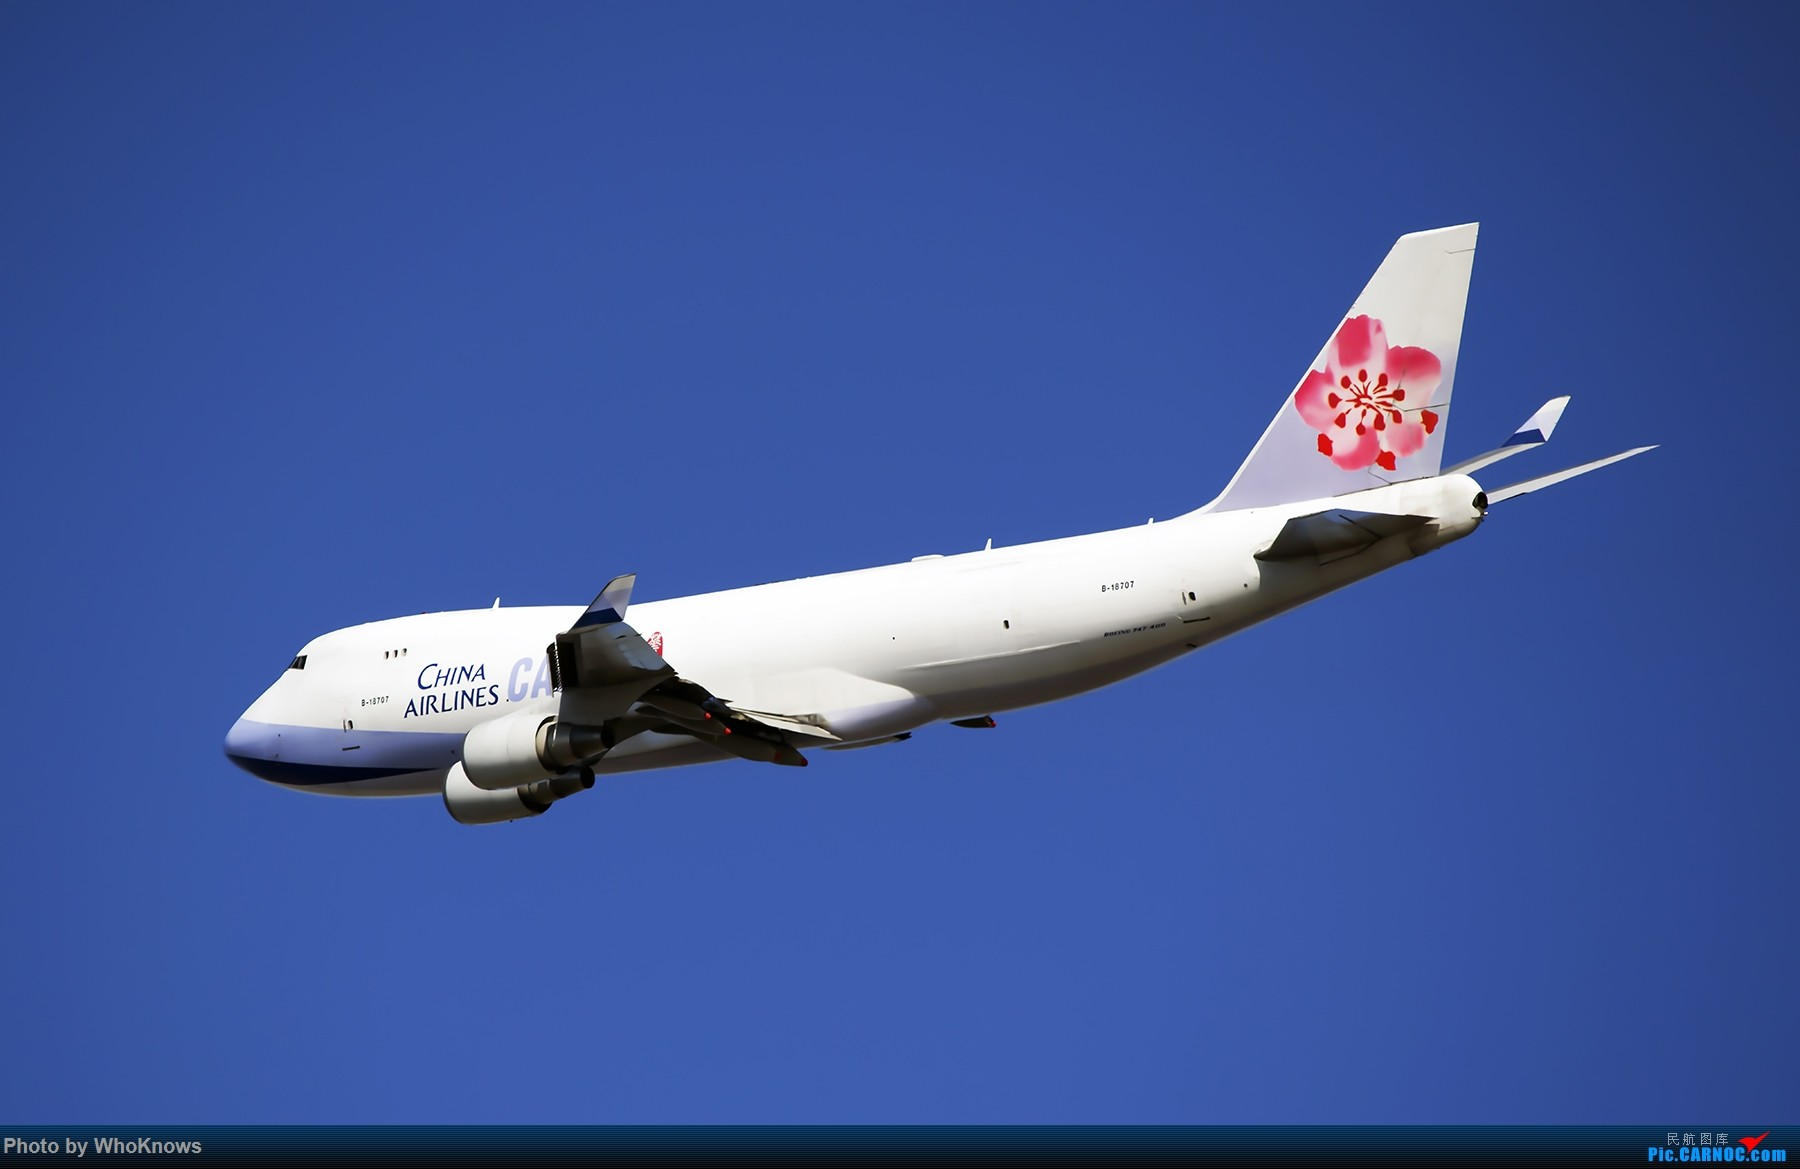 [原创]JFK BOEING 747 B-18707 JFK